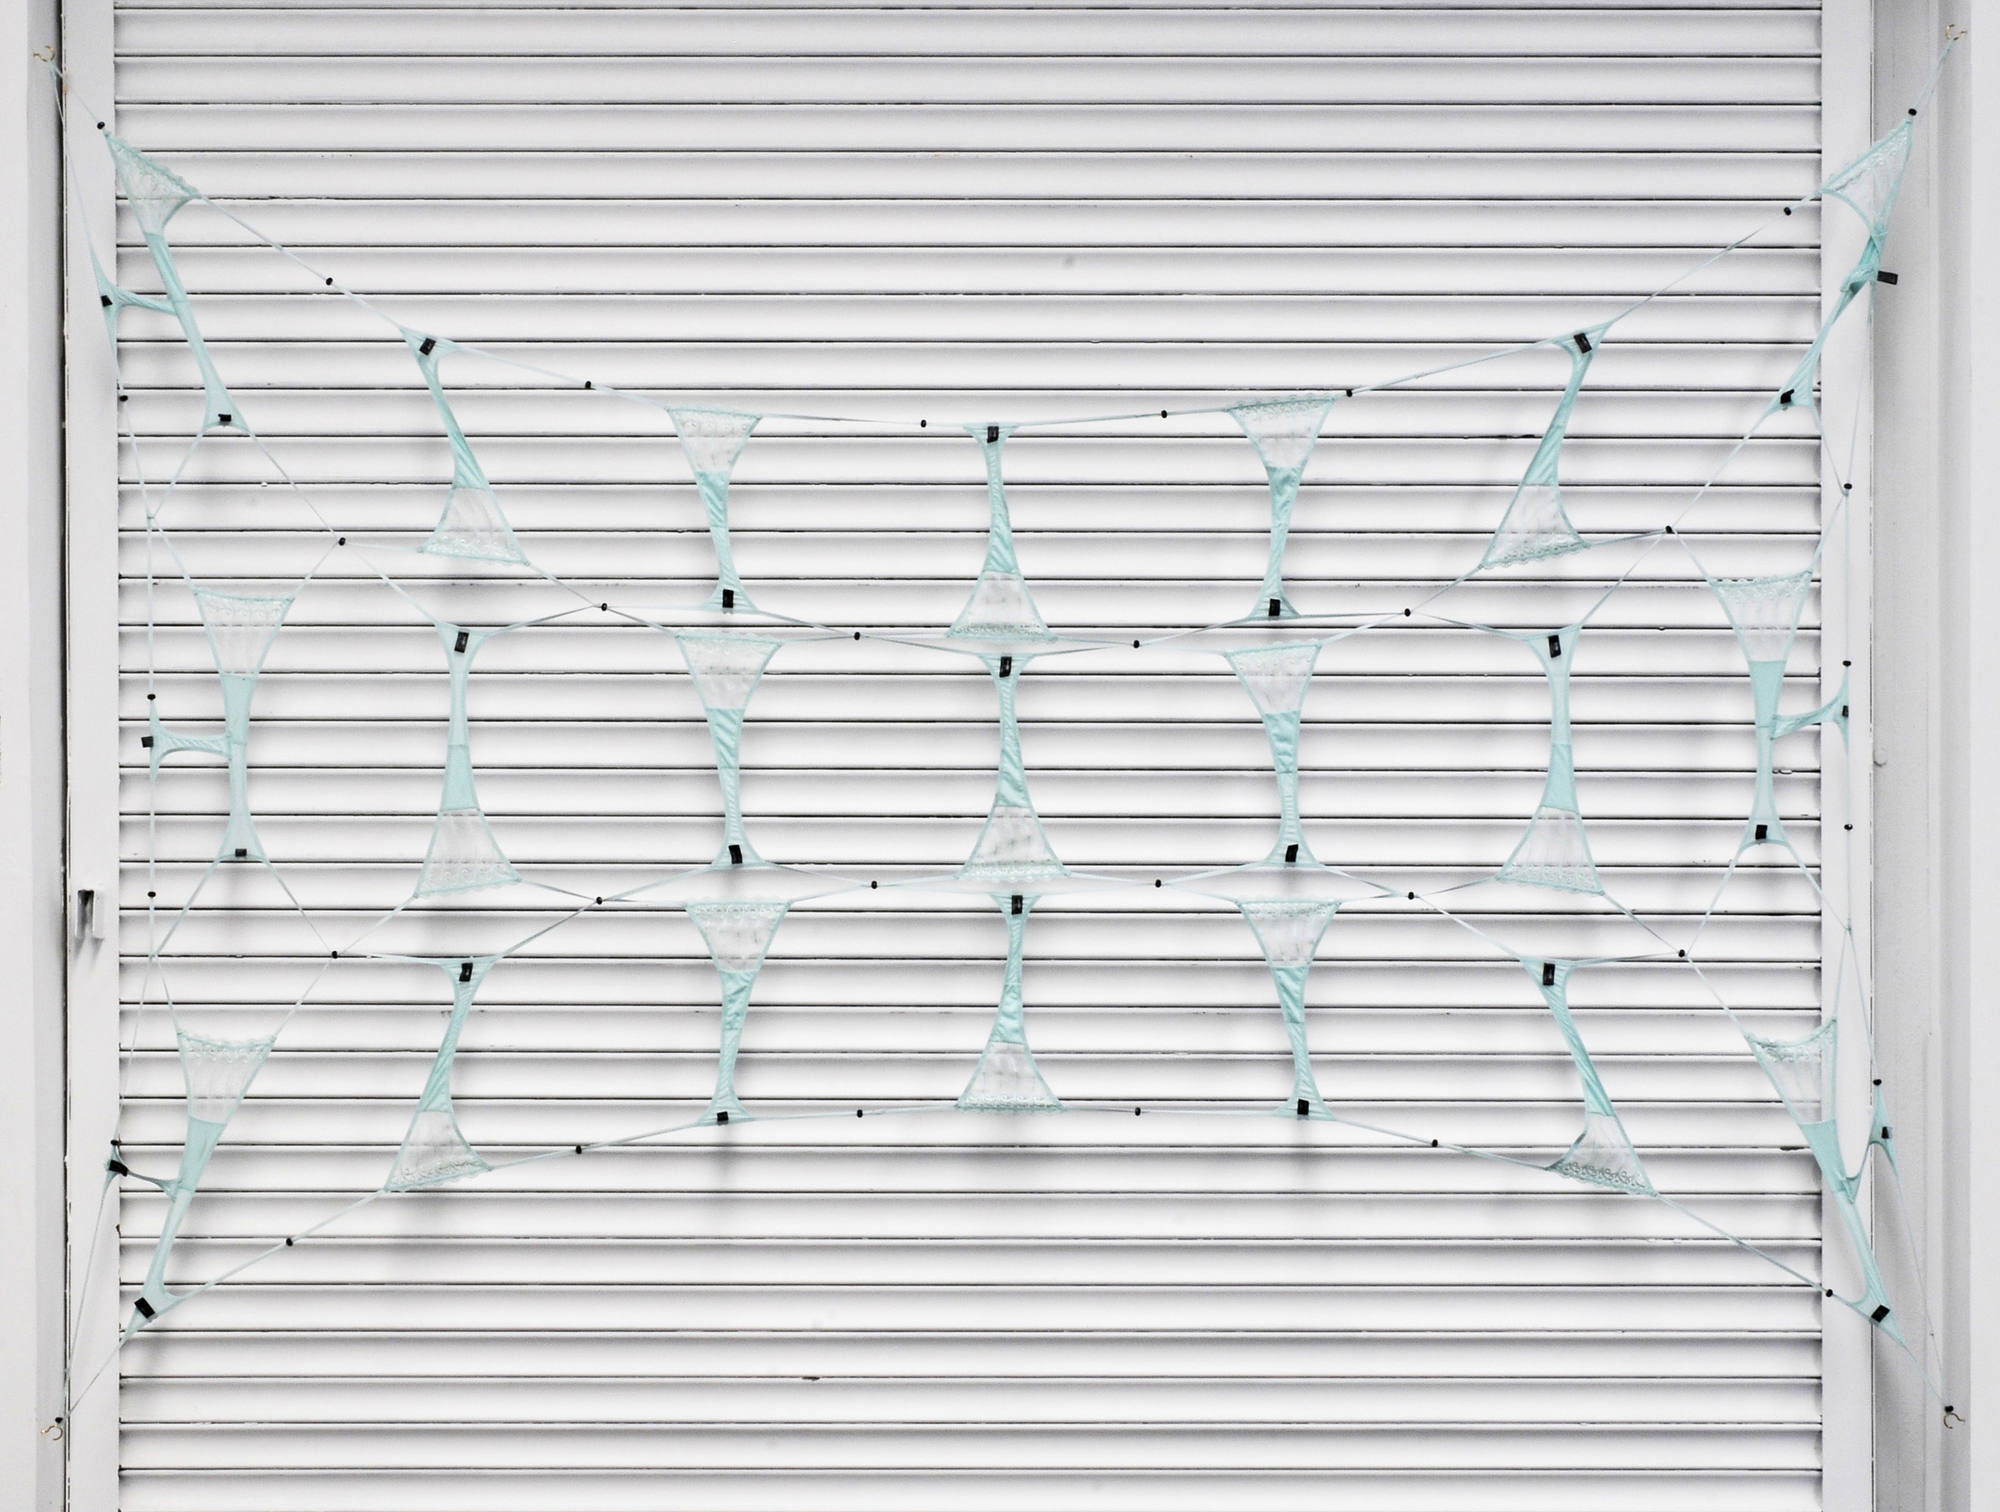 Amalia Ulman - Untitled (Safety Net), 2014